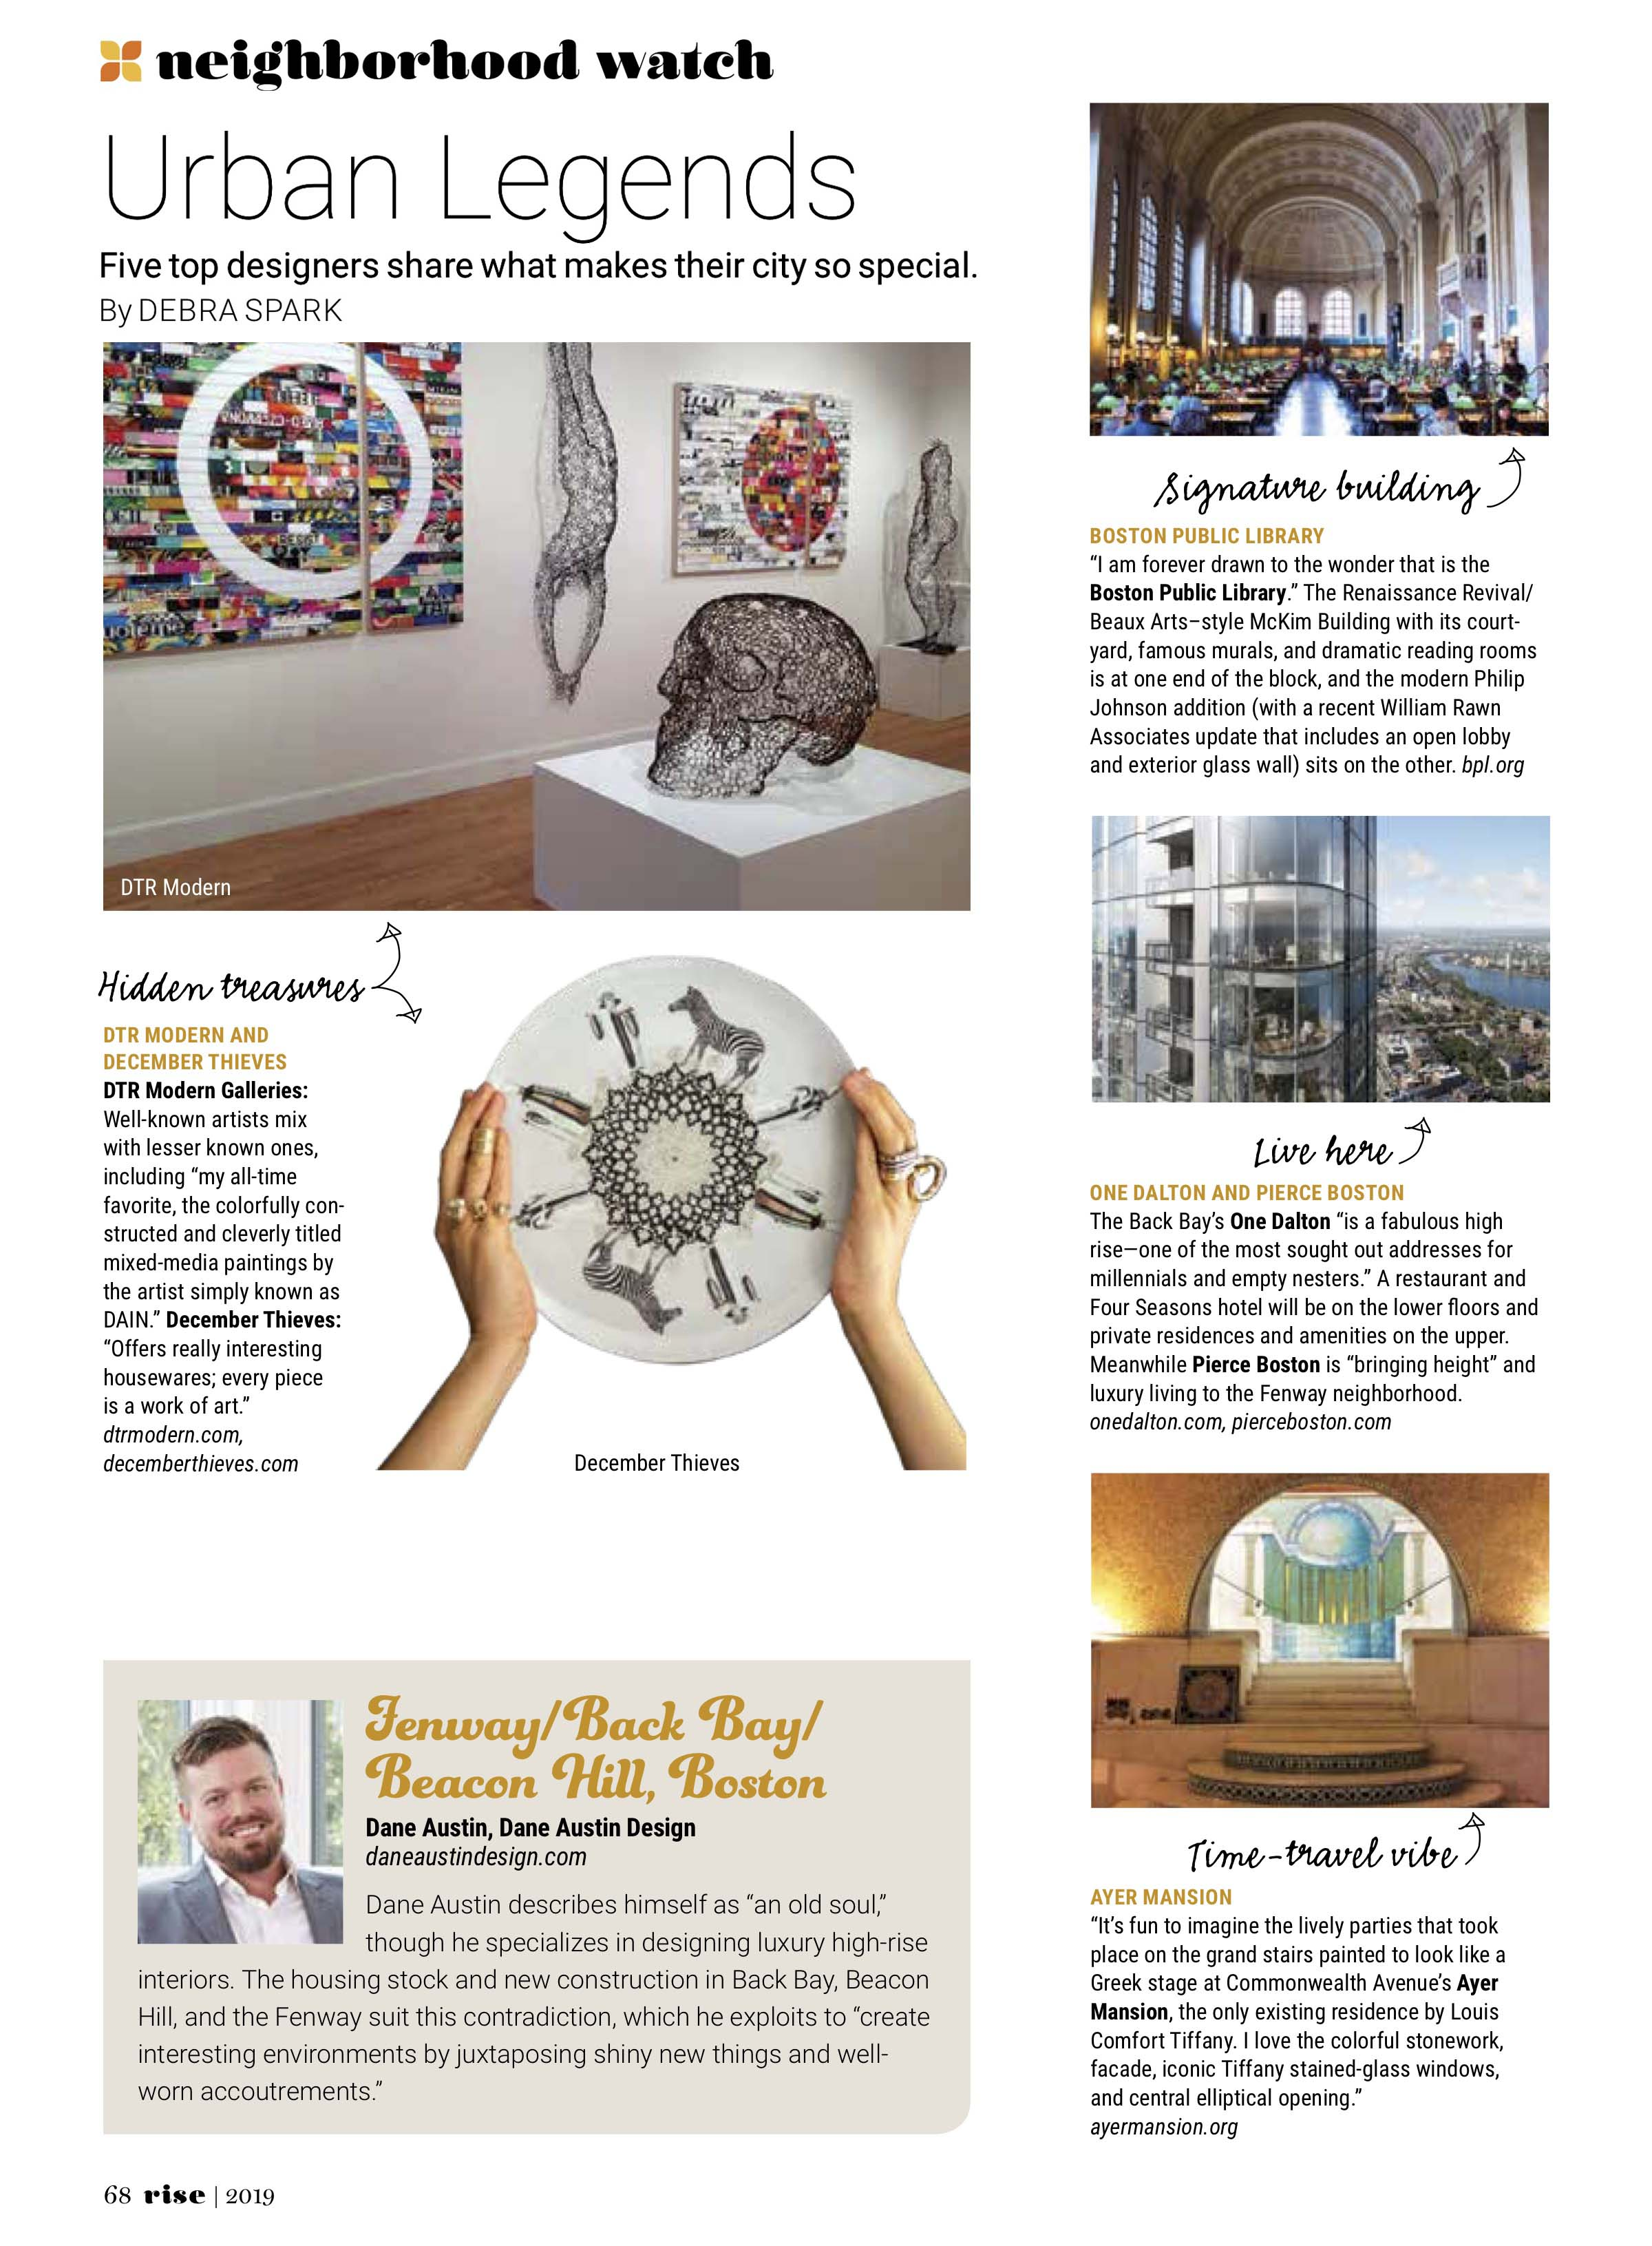 Dane Austin Design featured in Rise Magazine, Spring 2019